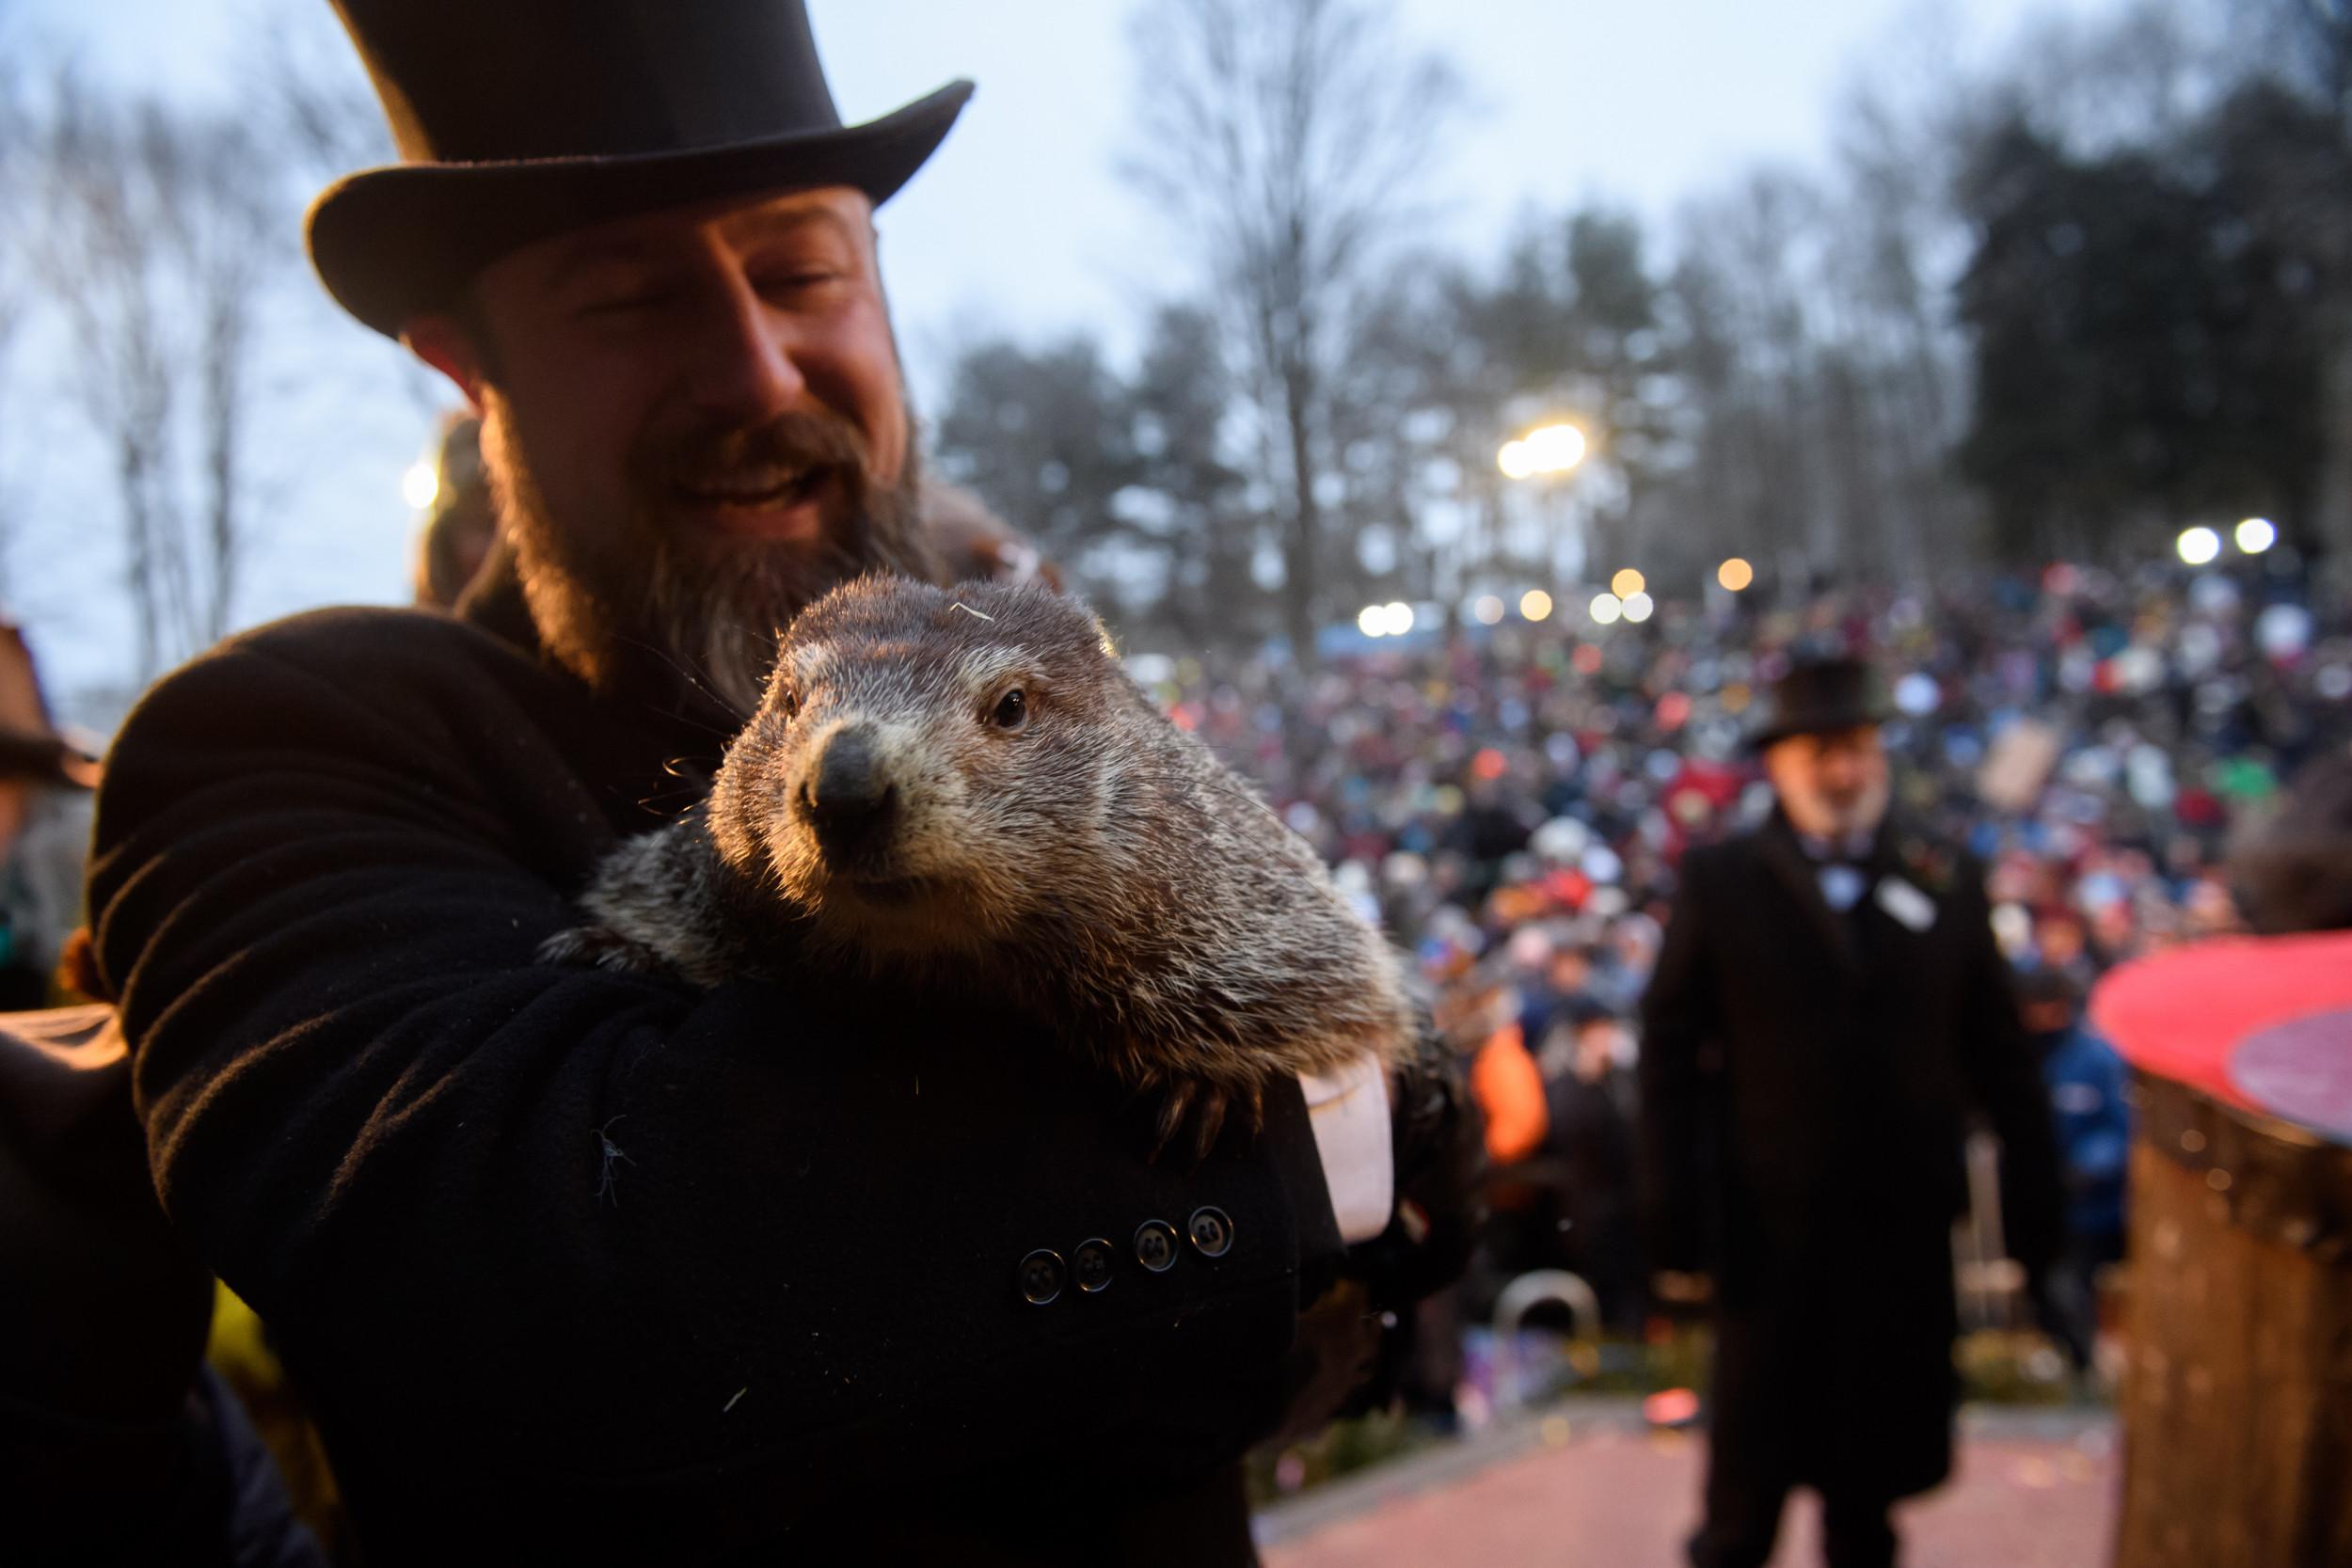 groundhog day 2020 punxsutawney